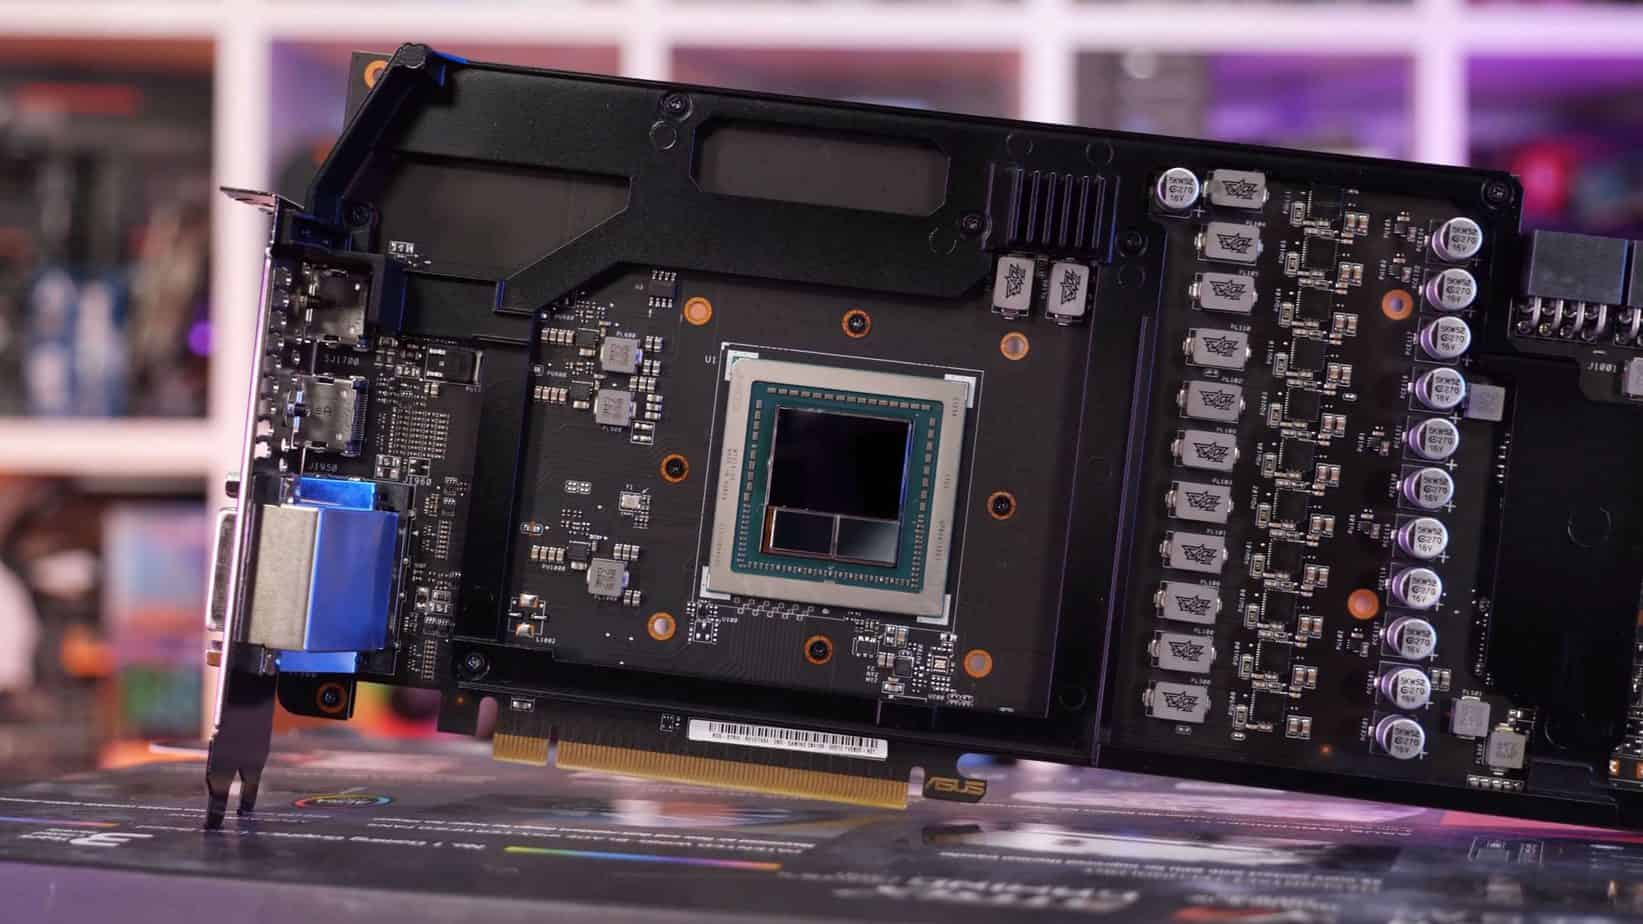 Radeon RX 5600 XT vs. GeForce GTX 1060 6GB vs. GTX 1070: 32 Game Benchmark